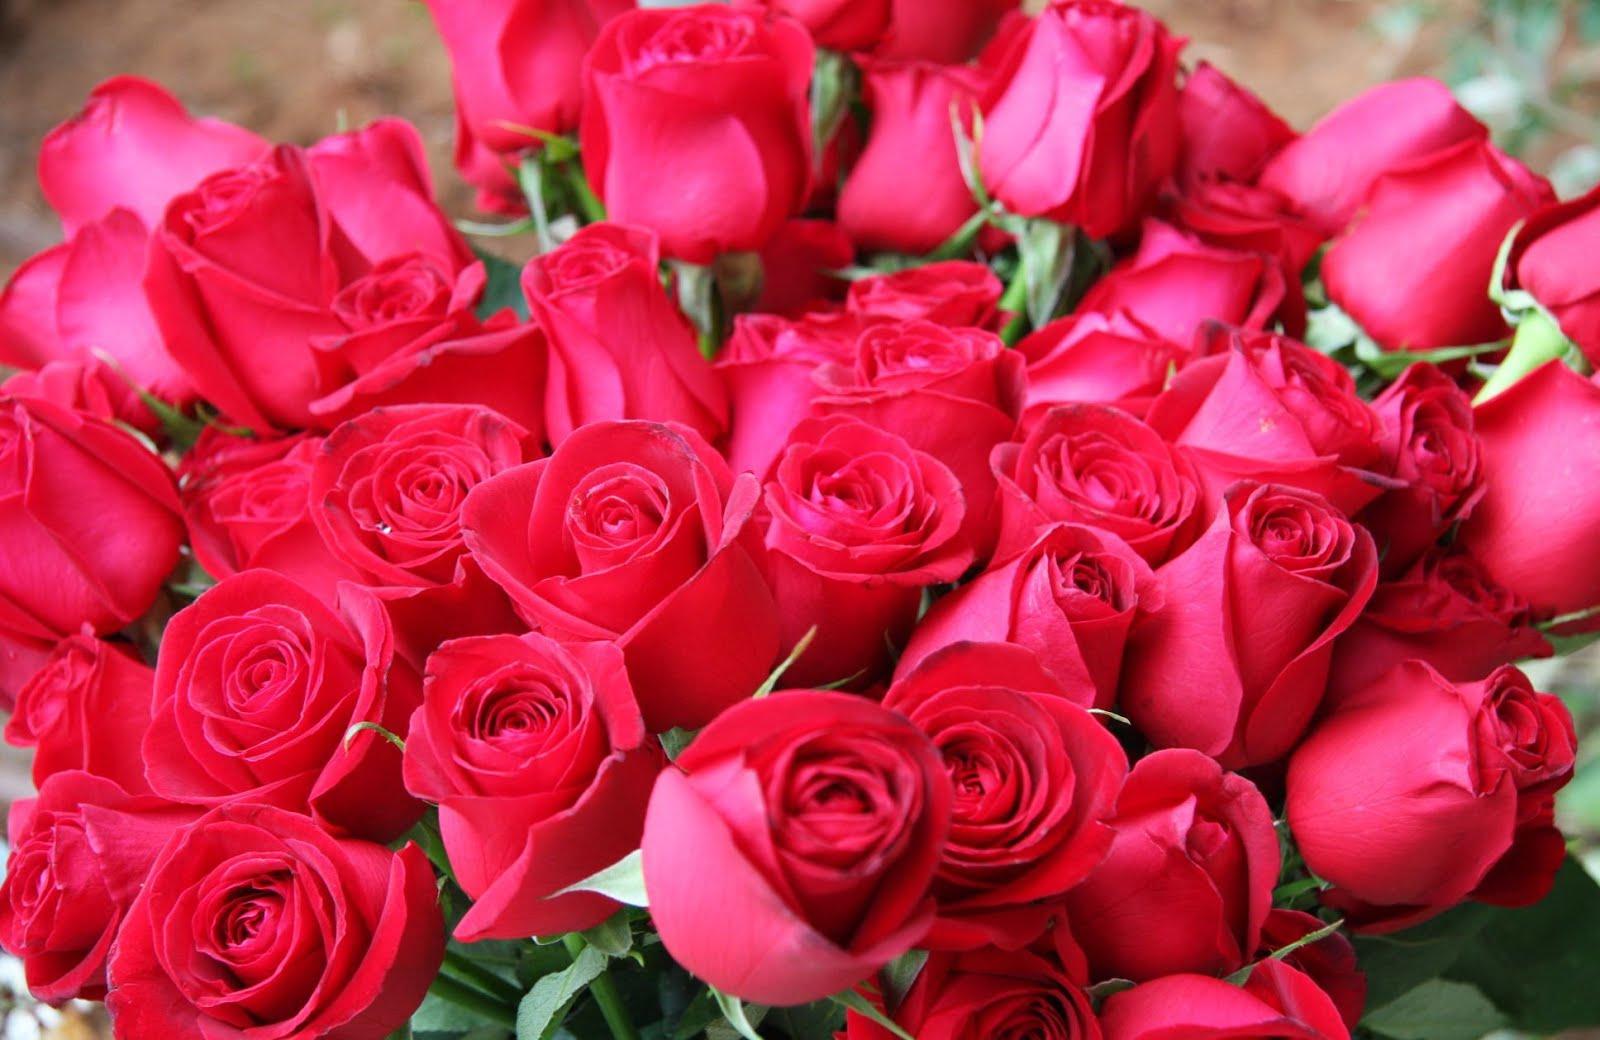 http://2.bp.blogspot.com/-pp9j4-BtLsE/UNDb5YQuOzI/AAAAAAABF7A/FrJBtBcXc50/s1600/bm-image-761640.jpeg